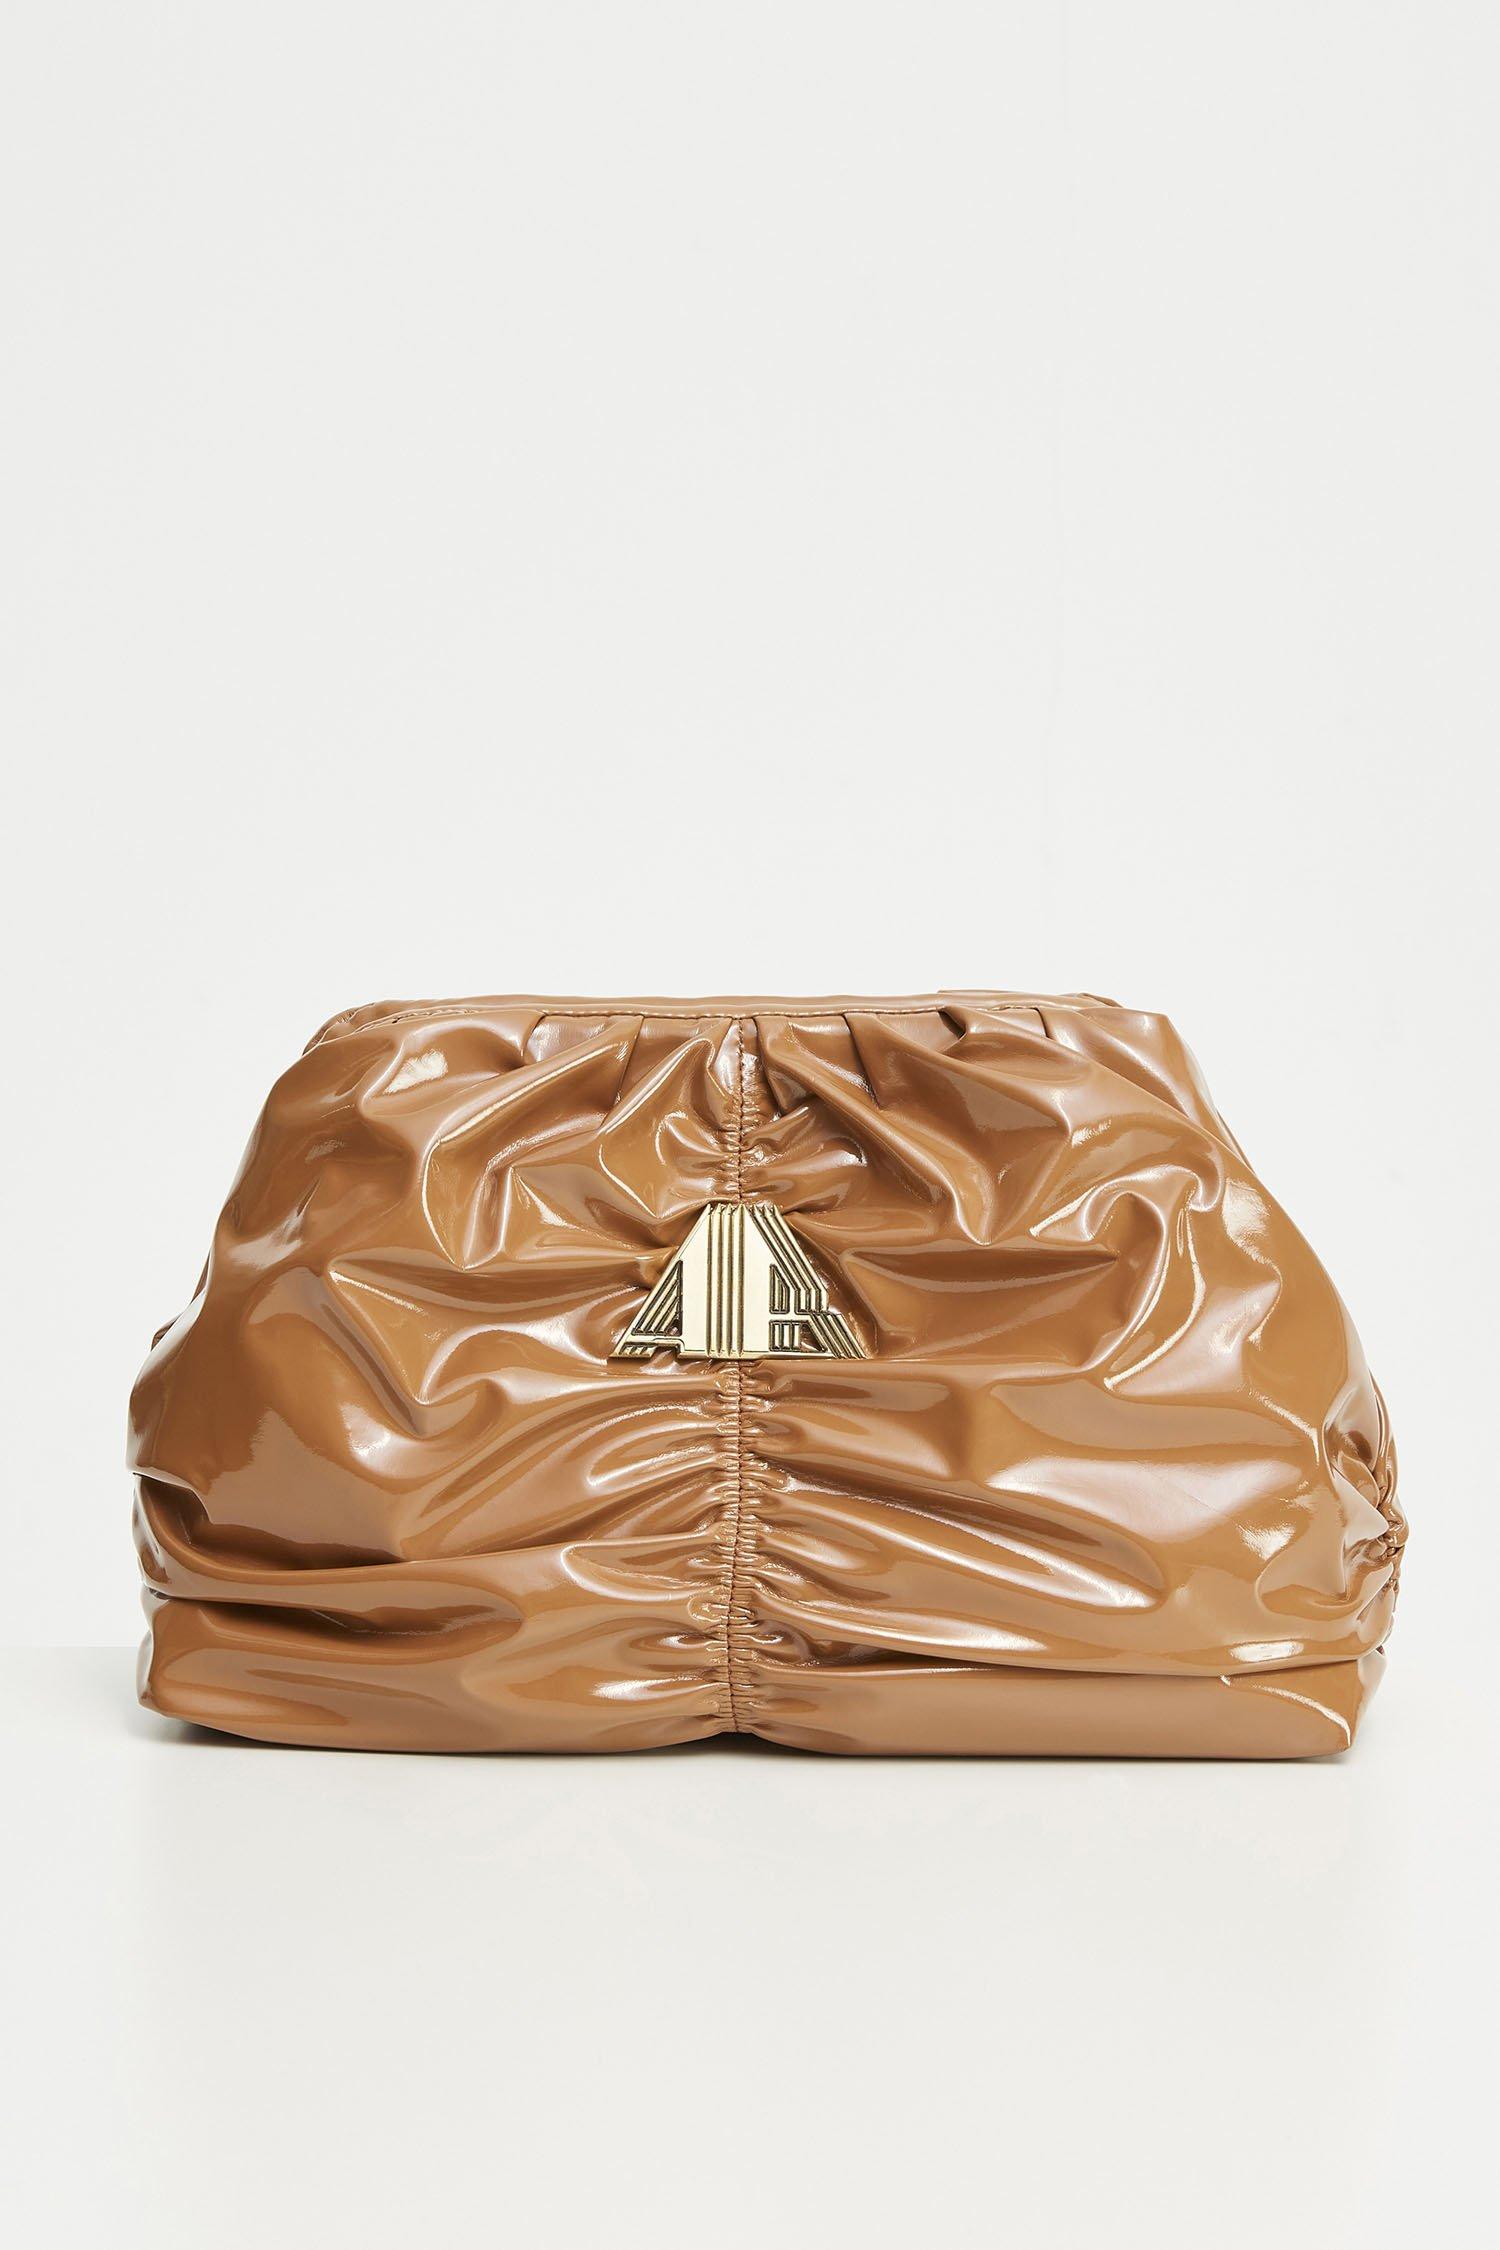 LOTTY BAG